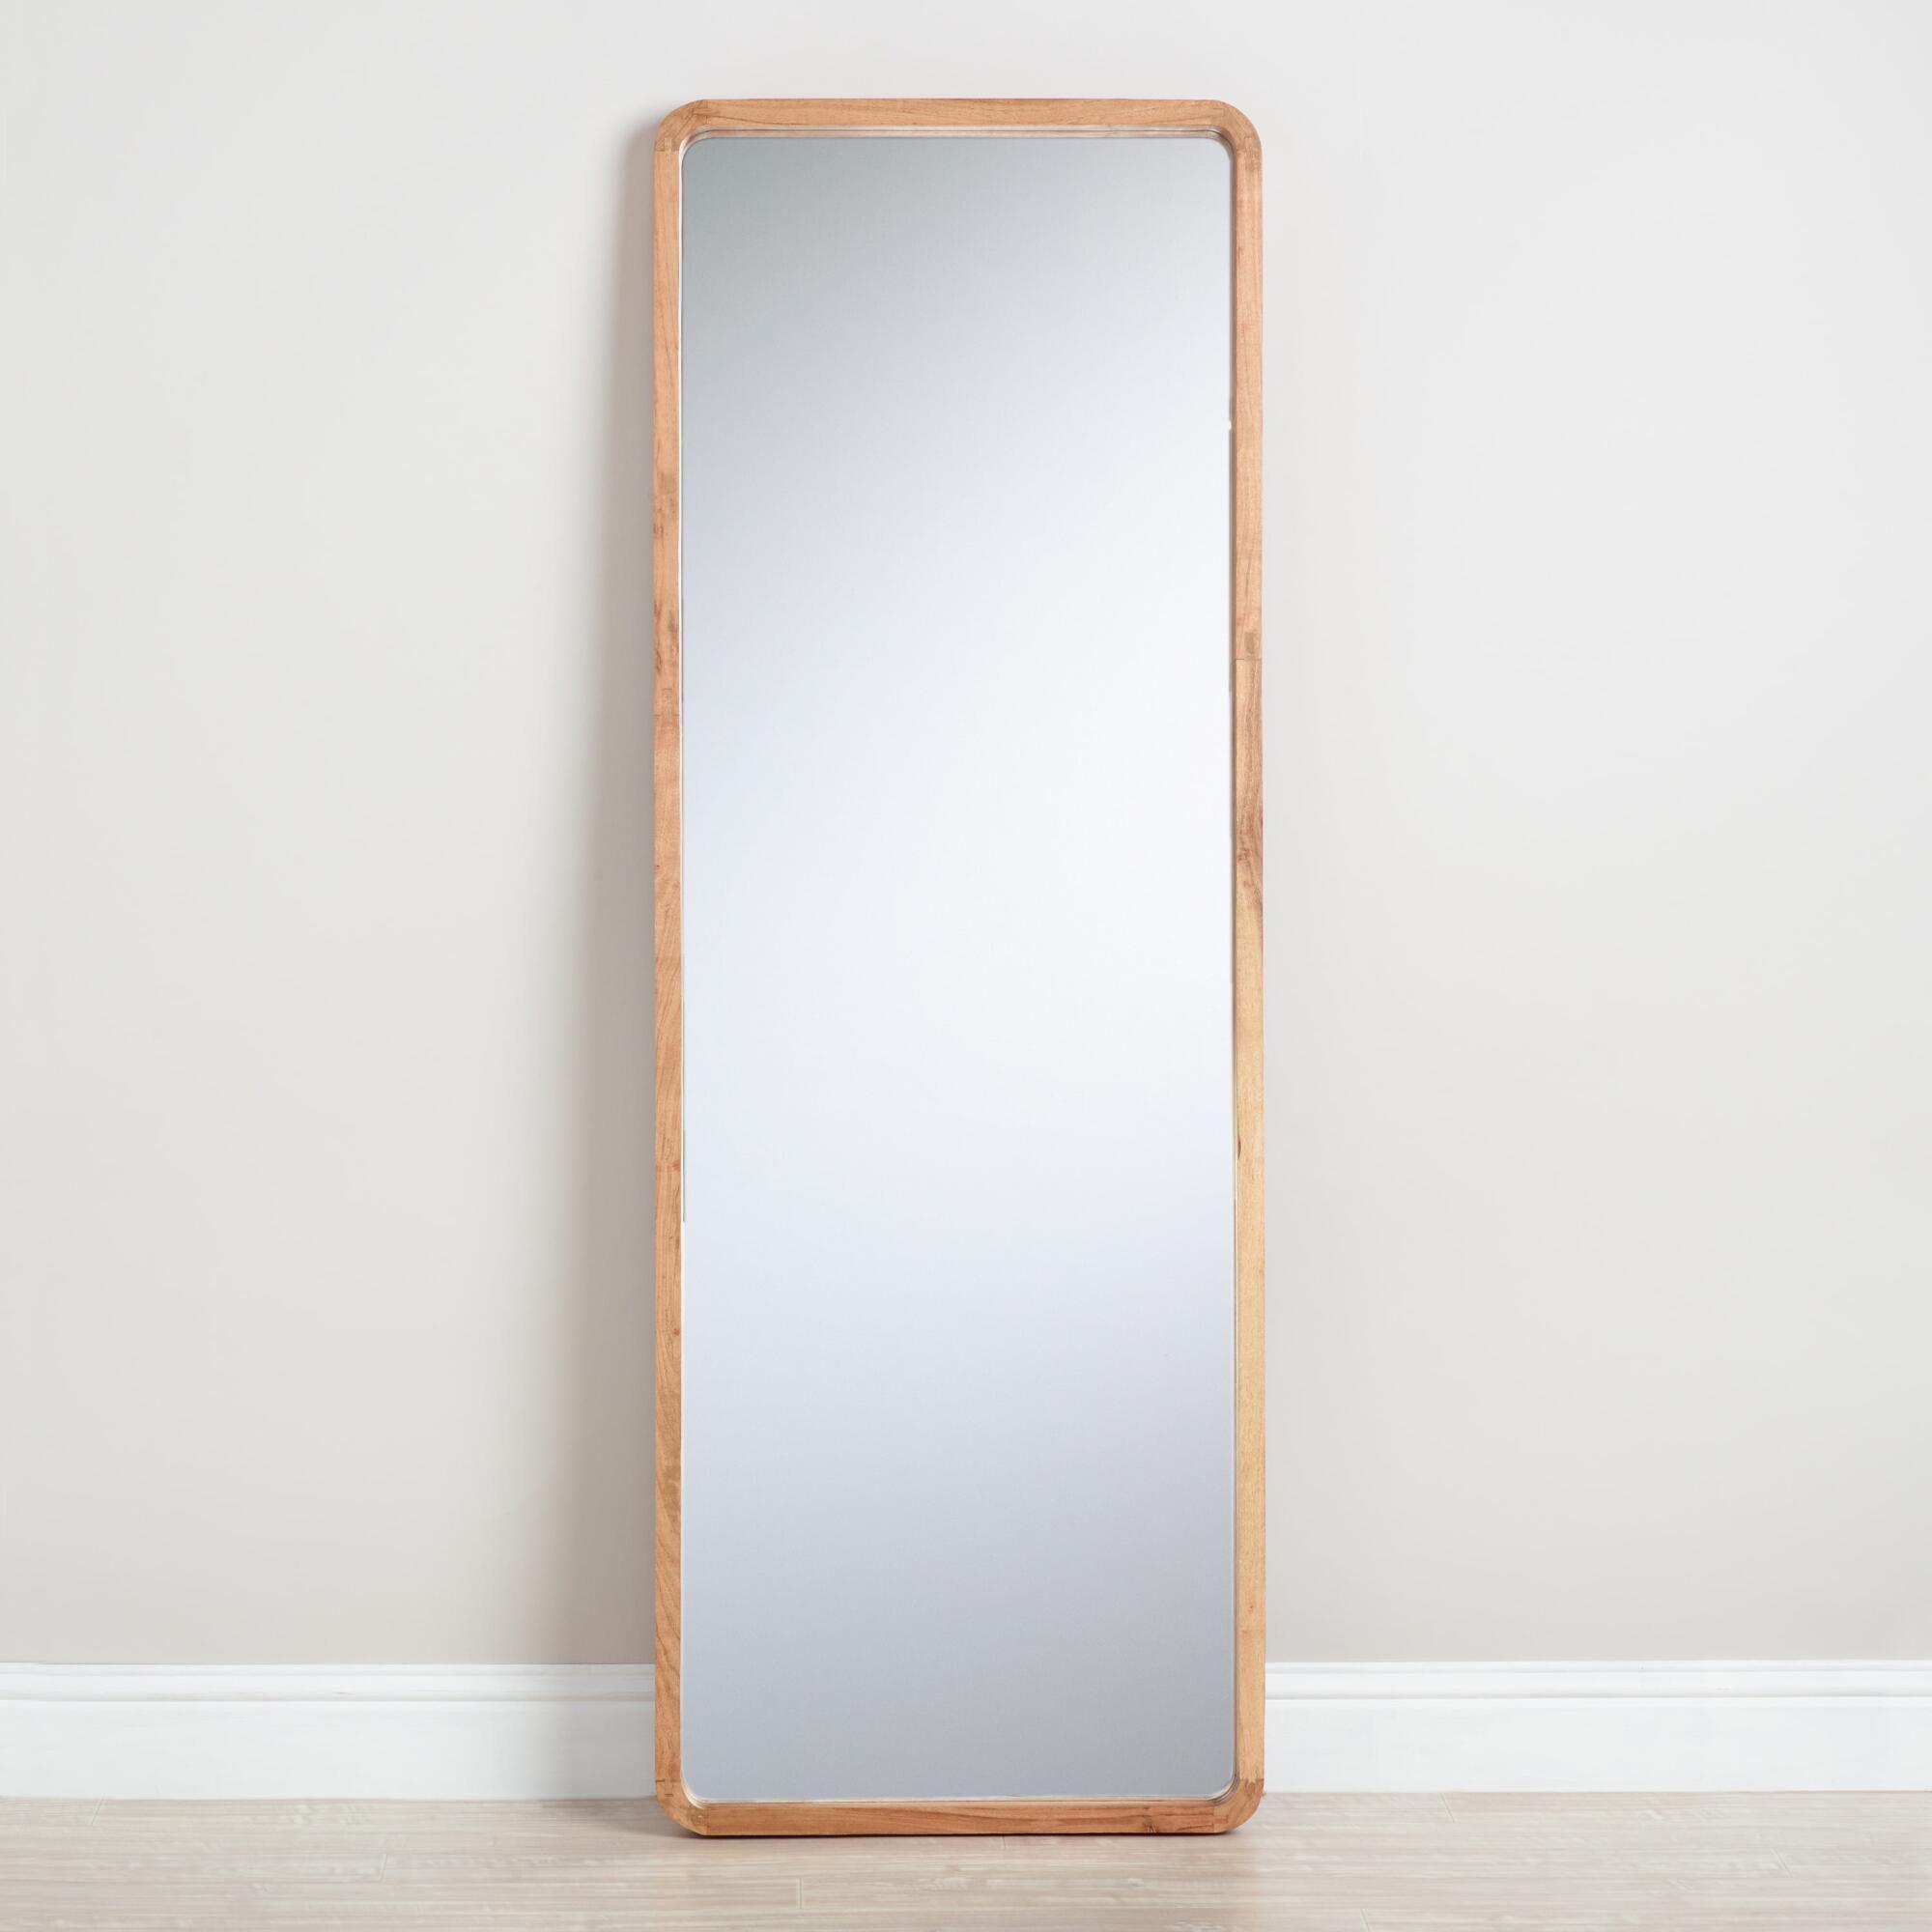 Natural Wood Leaning Full Length Floor Mirror By World Market Full Length Floor Mirror Floor Length Mirror Wood Full Length Mirror